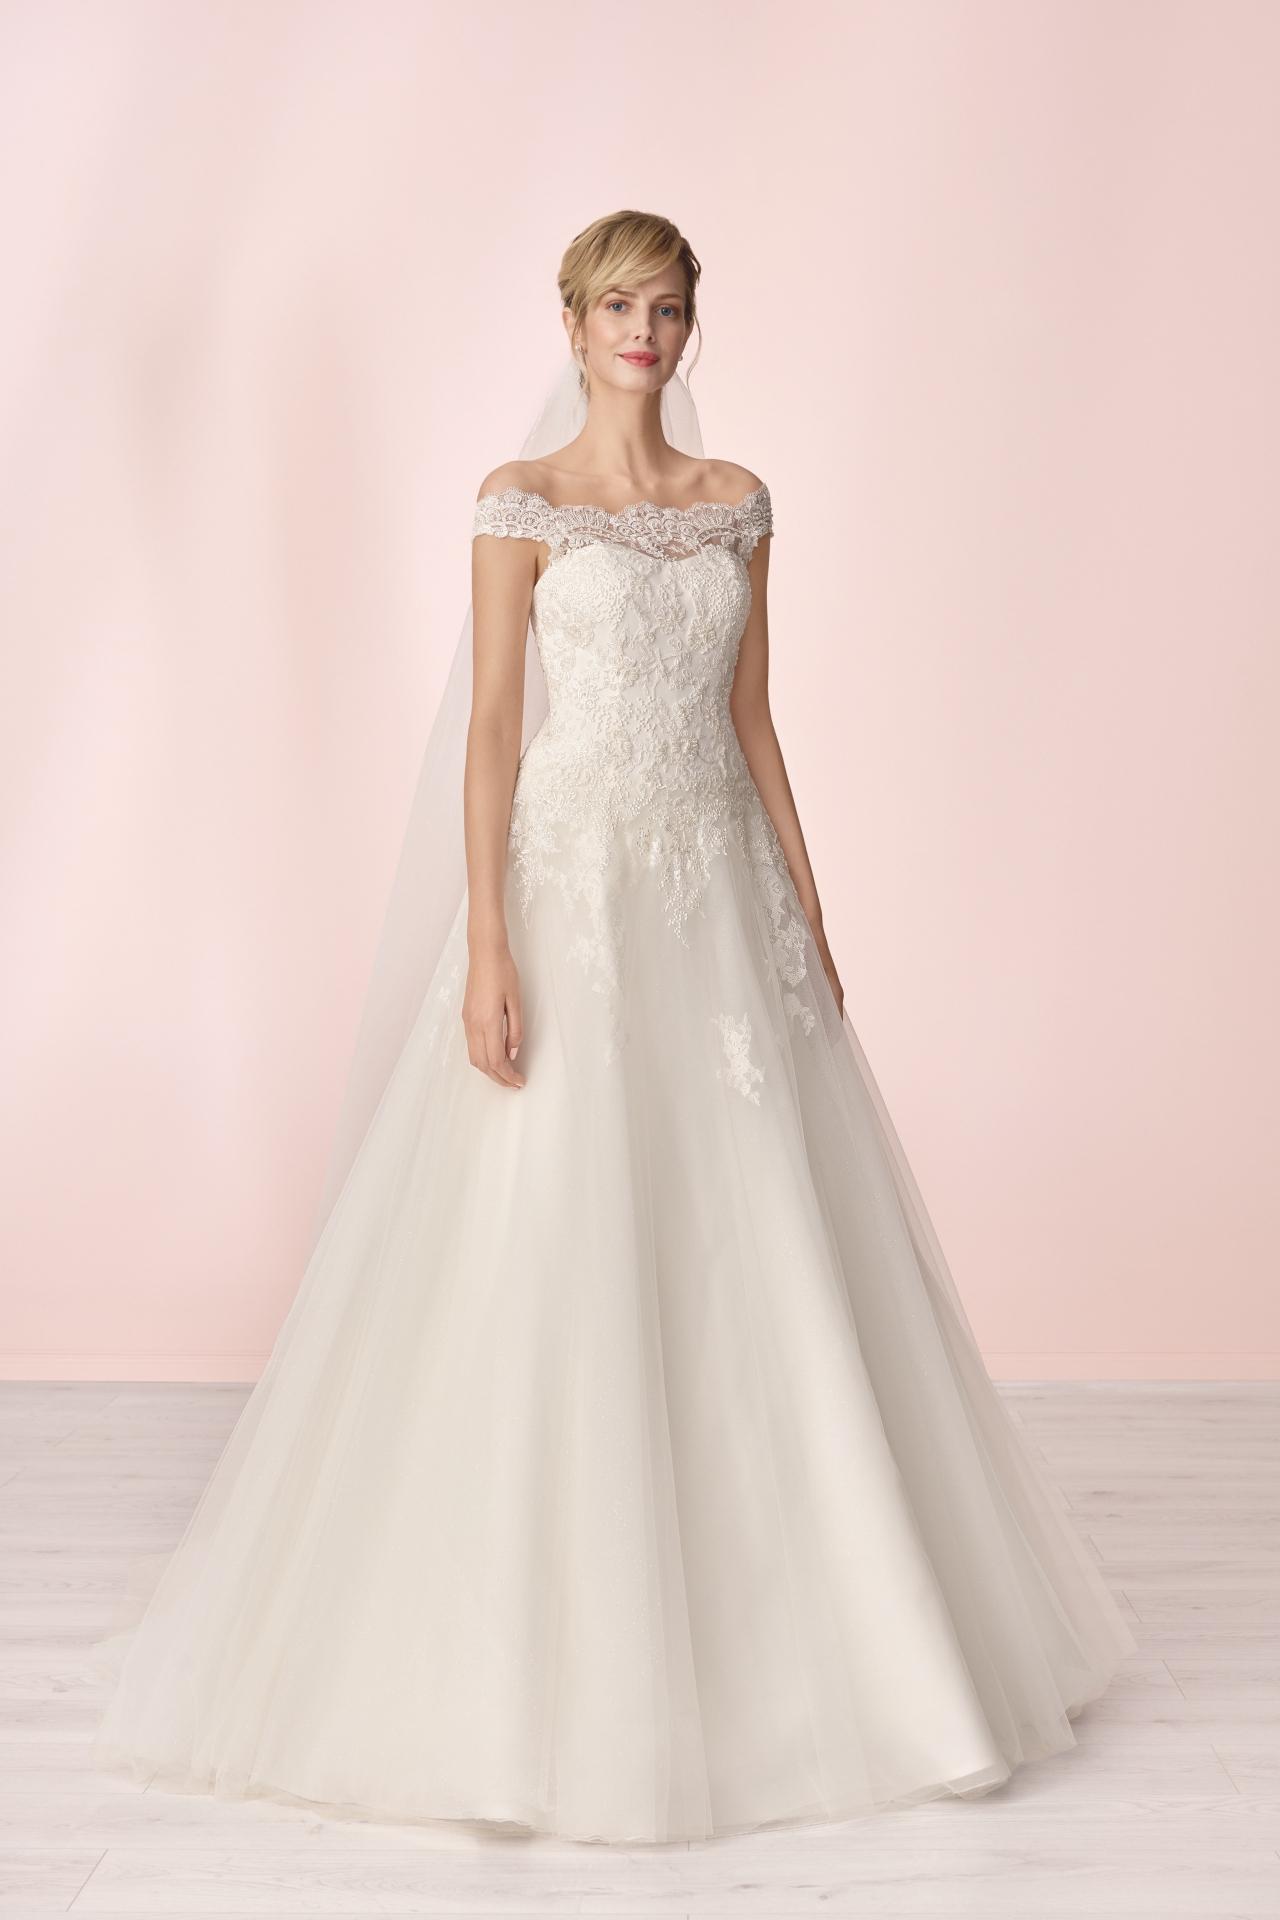 Brautkleid Elizabeth Konin 2019 - 4147T-1